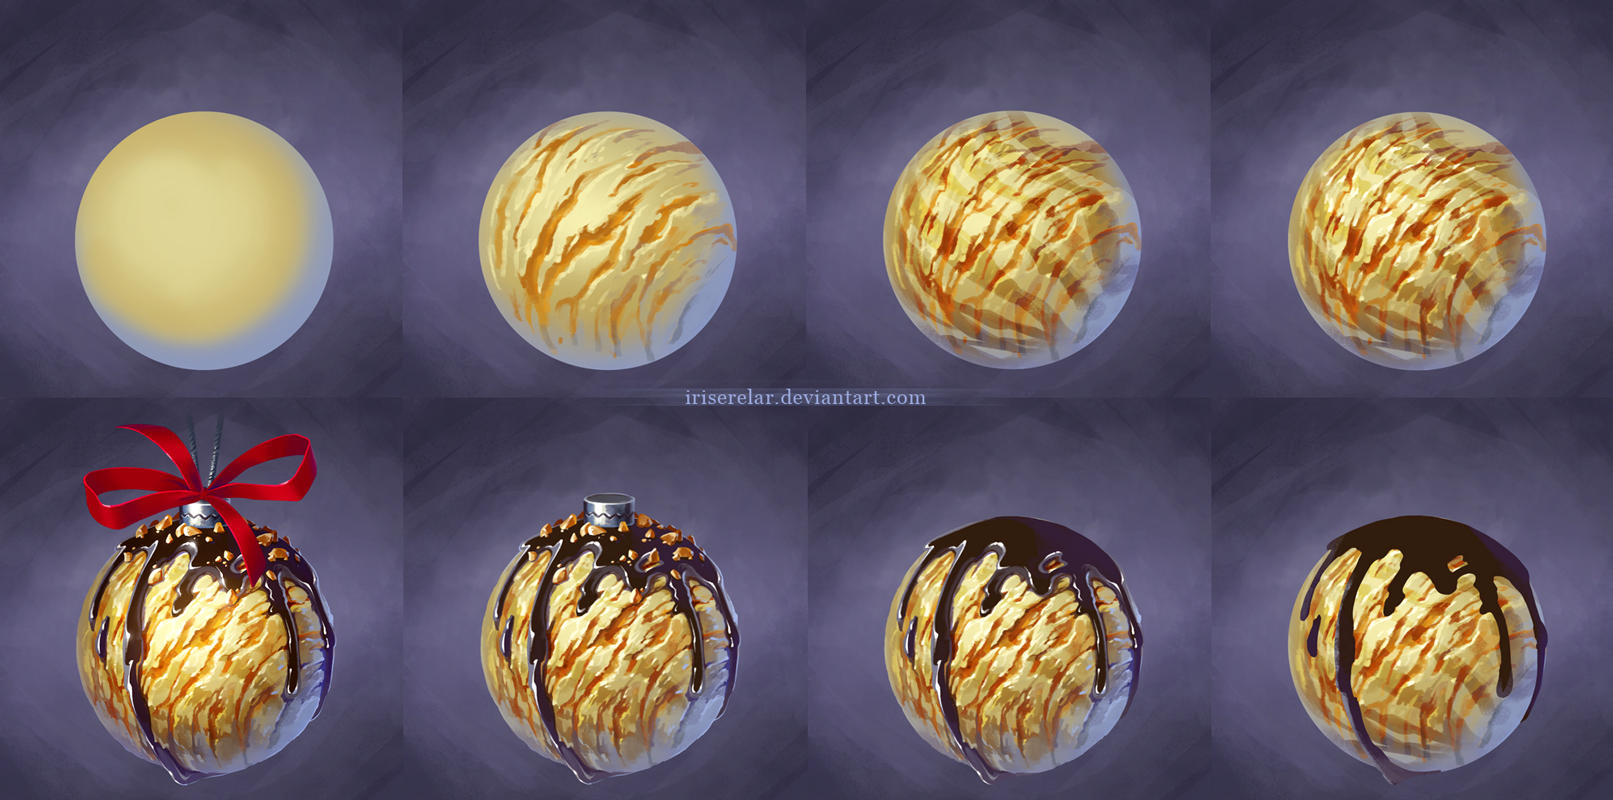 Ice-cream_ornament_steps by IrisErelar